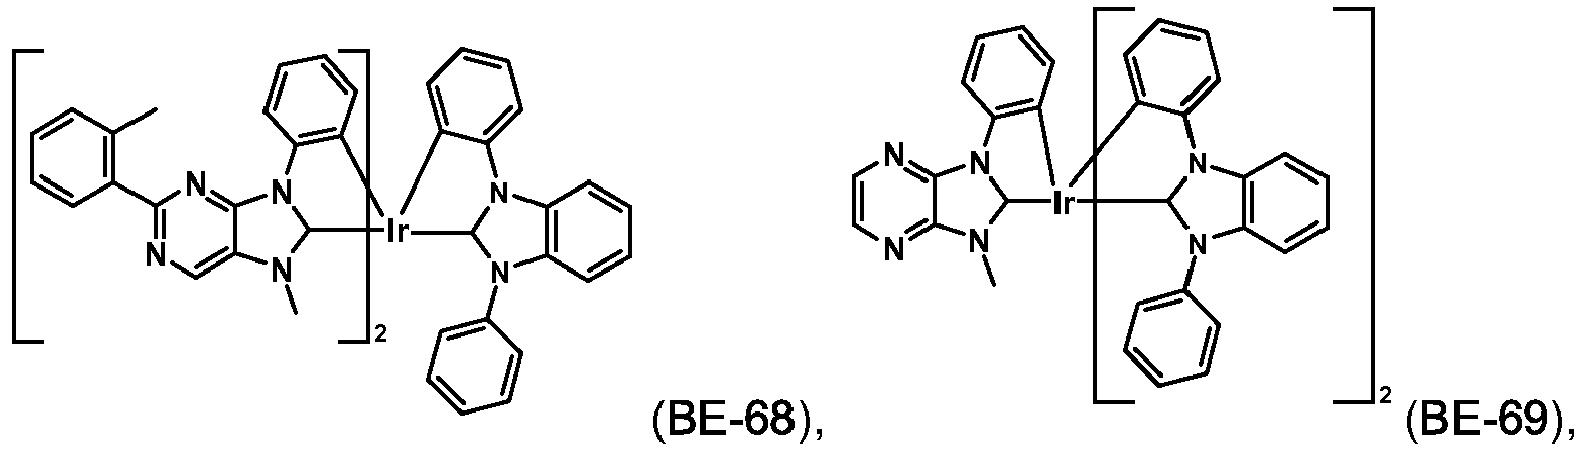 Figure imgb0780